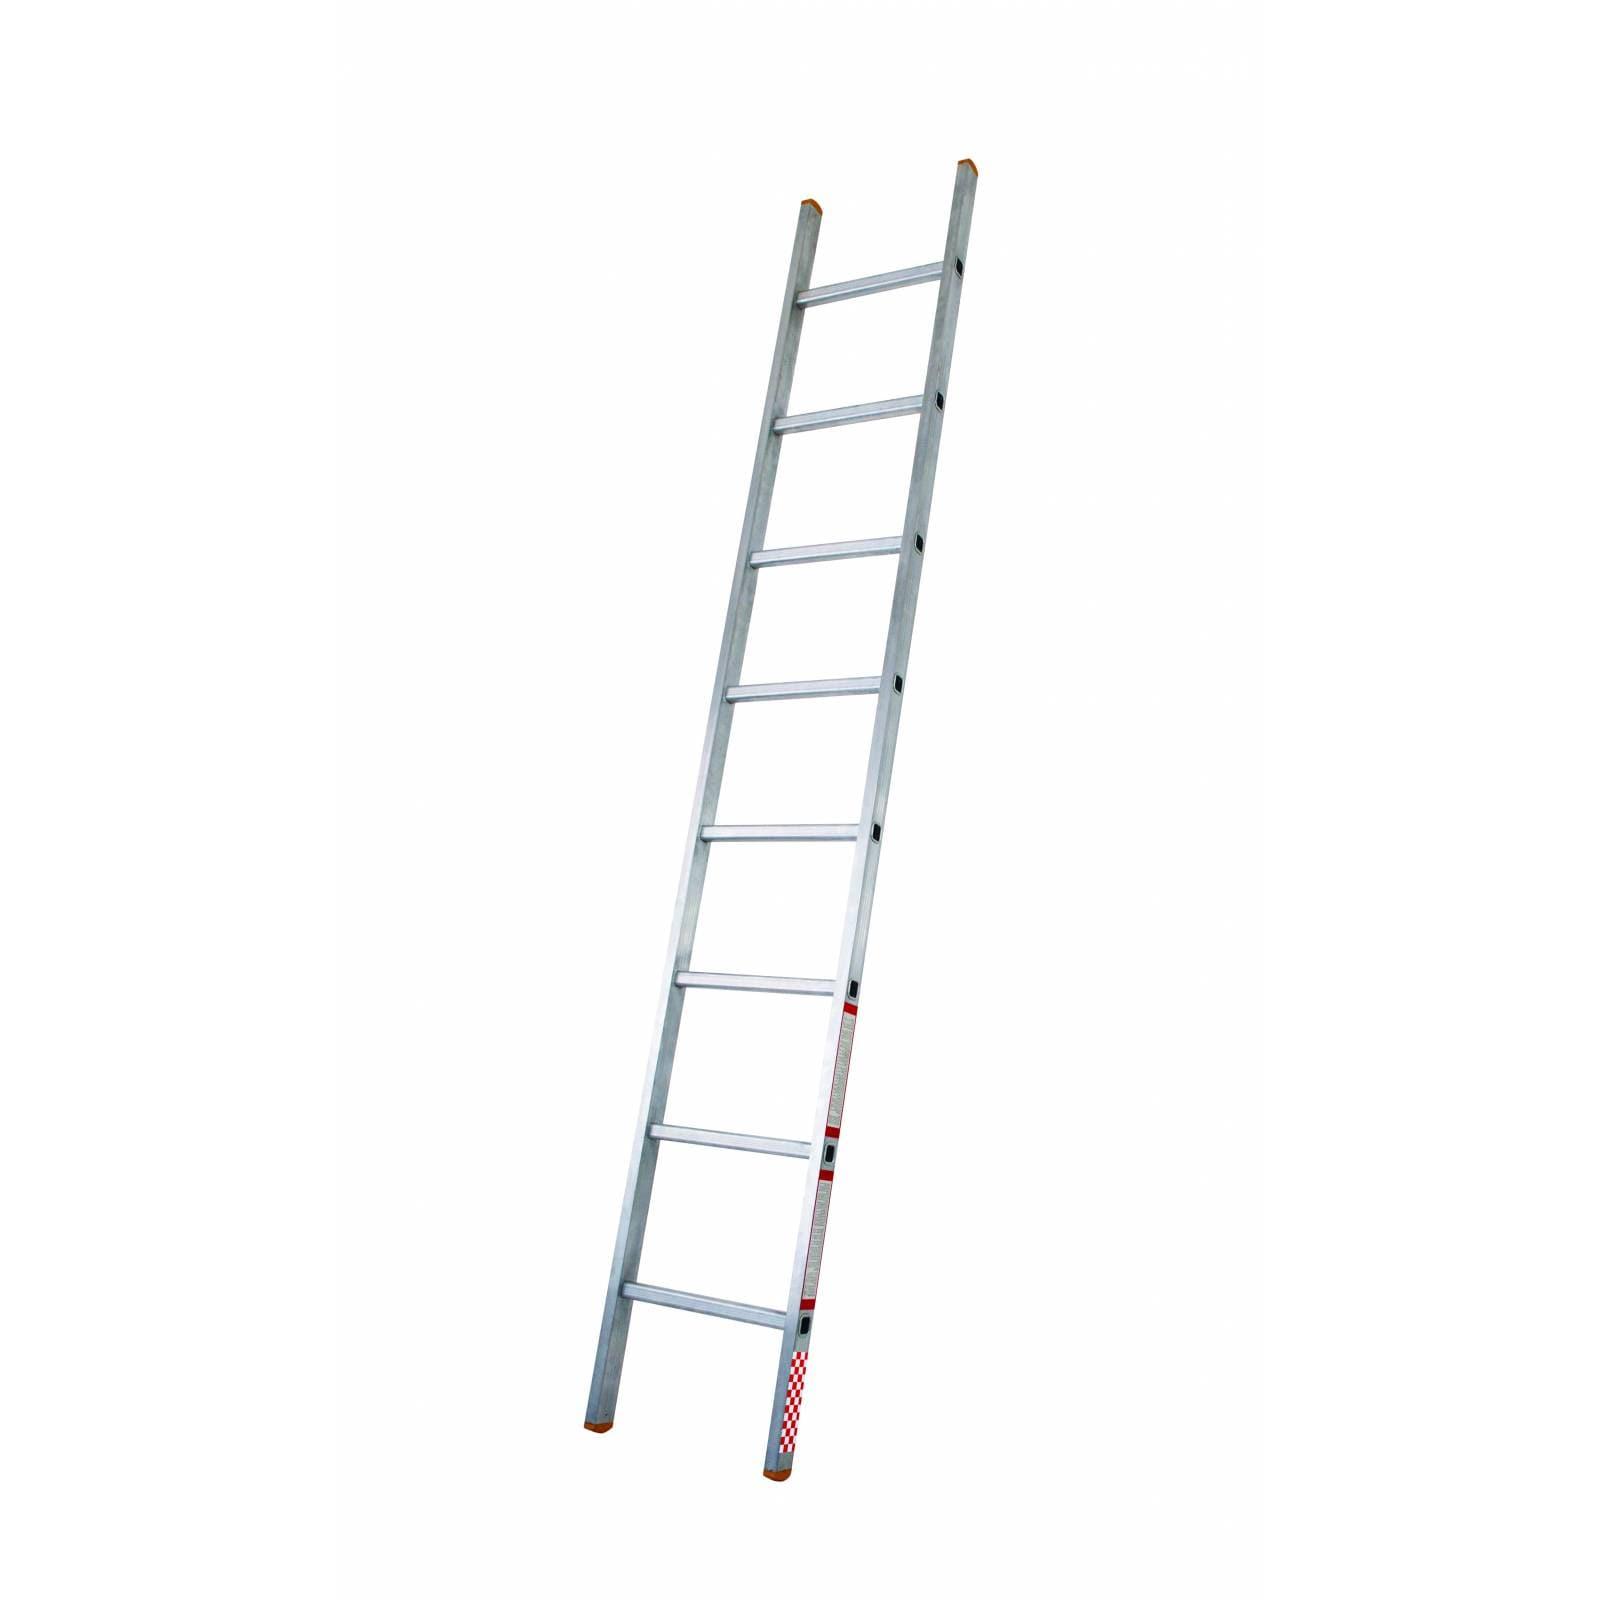 Escalera recta aluminio de 8 pelda os tipo iii 419308 for Escaleras 8 peldanos